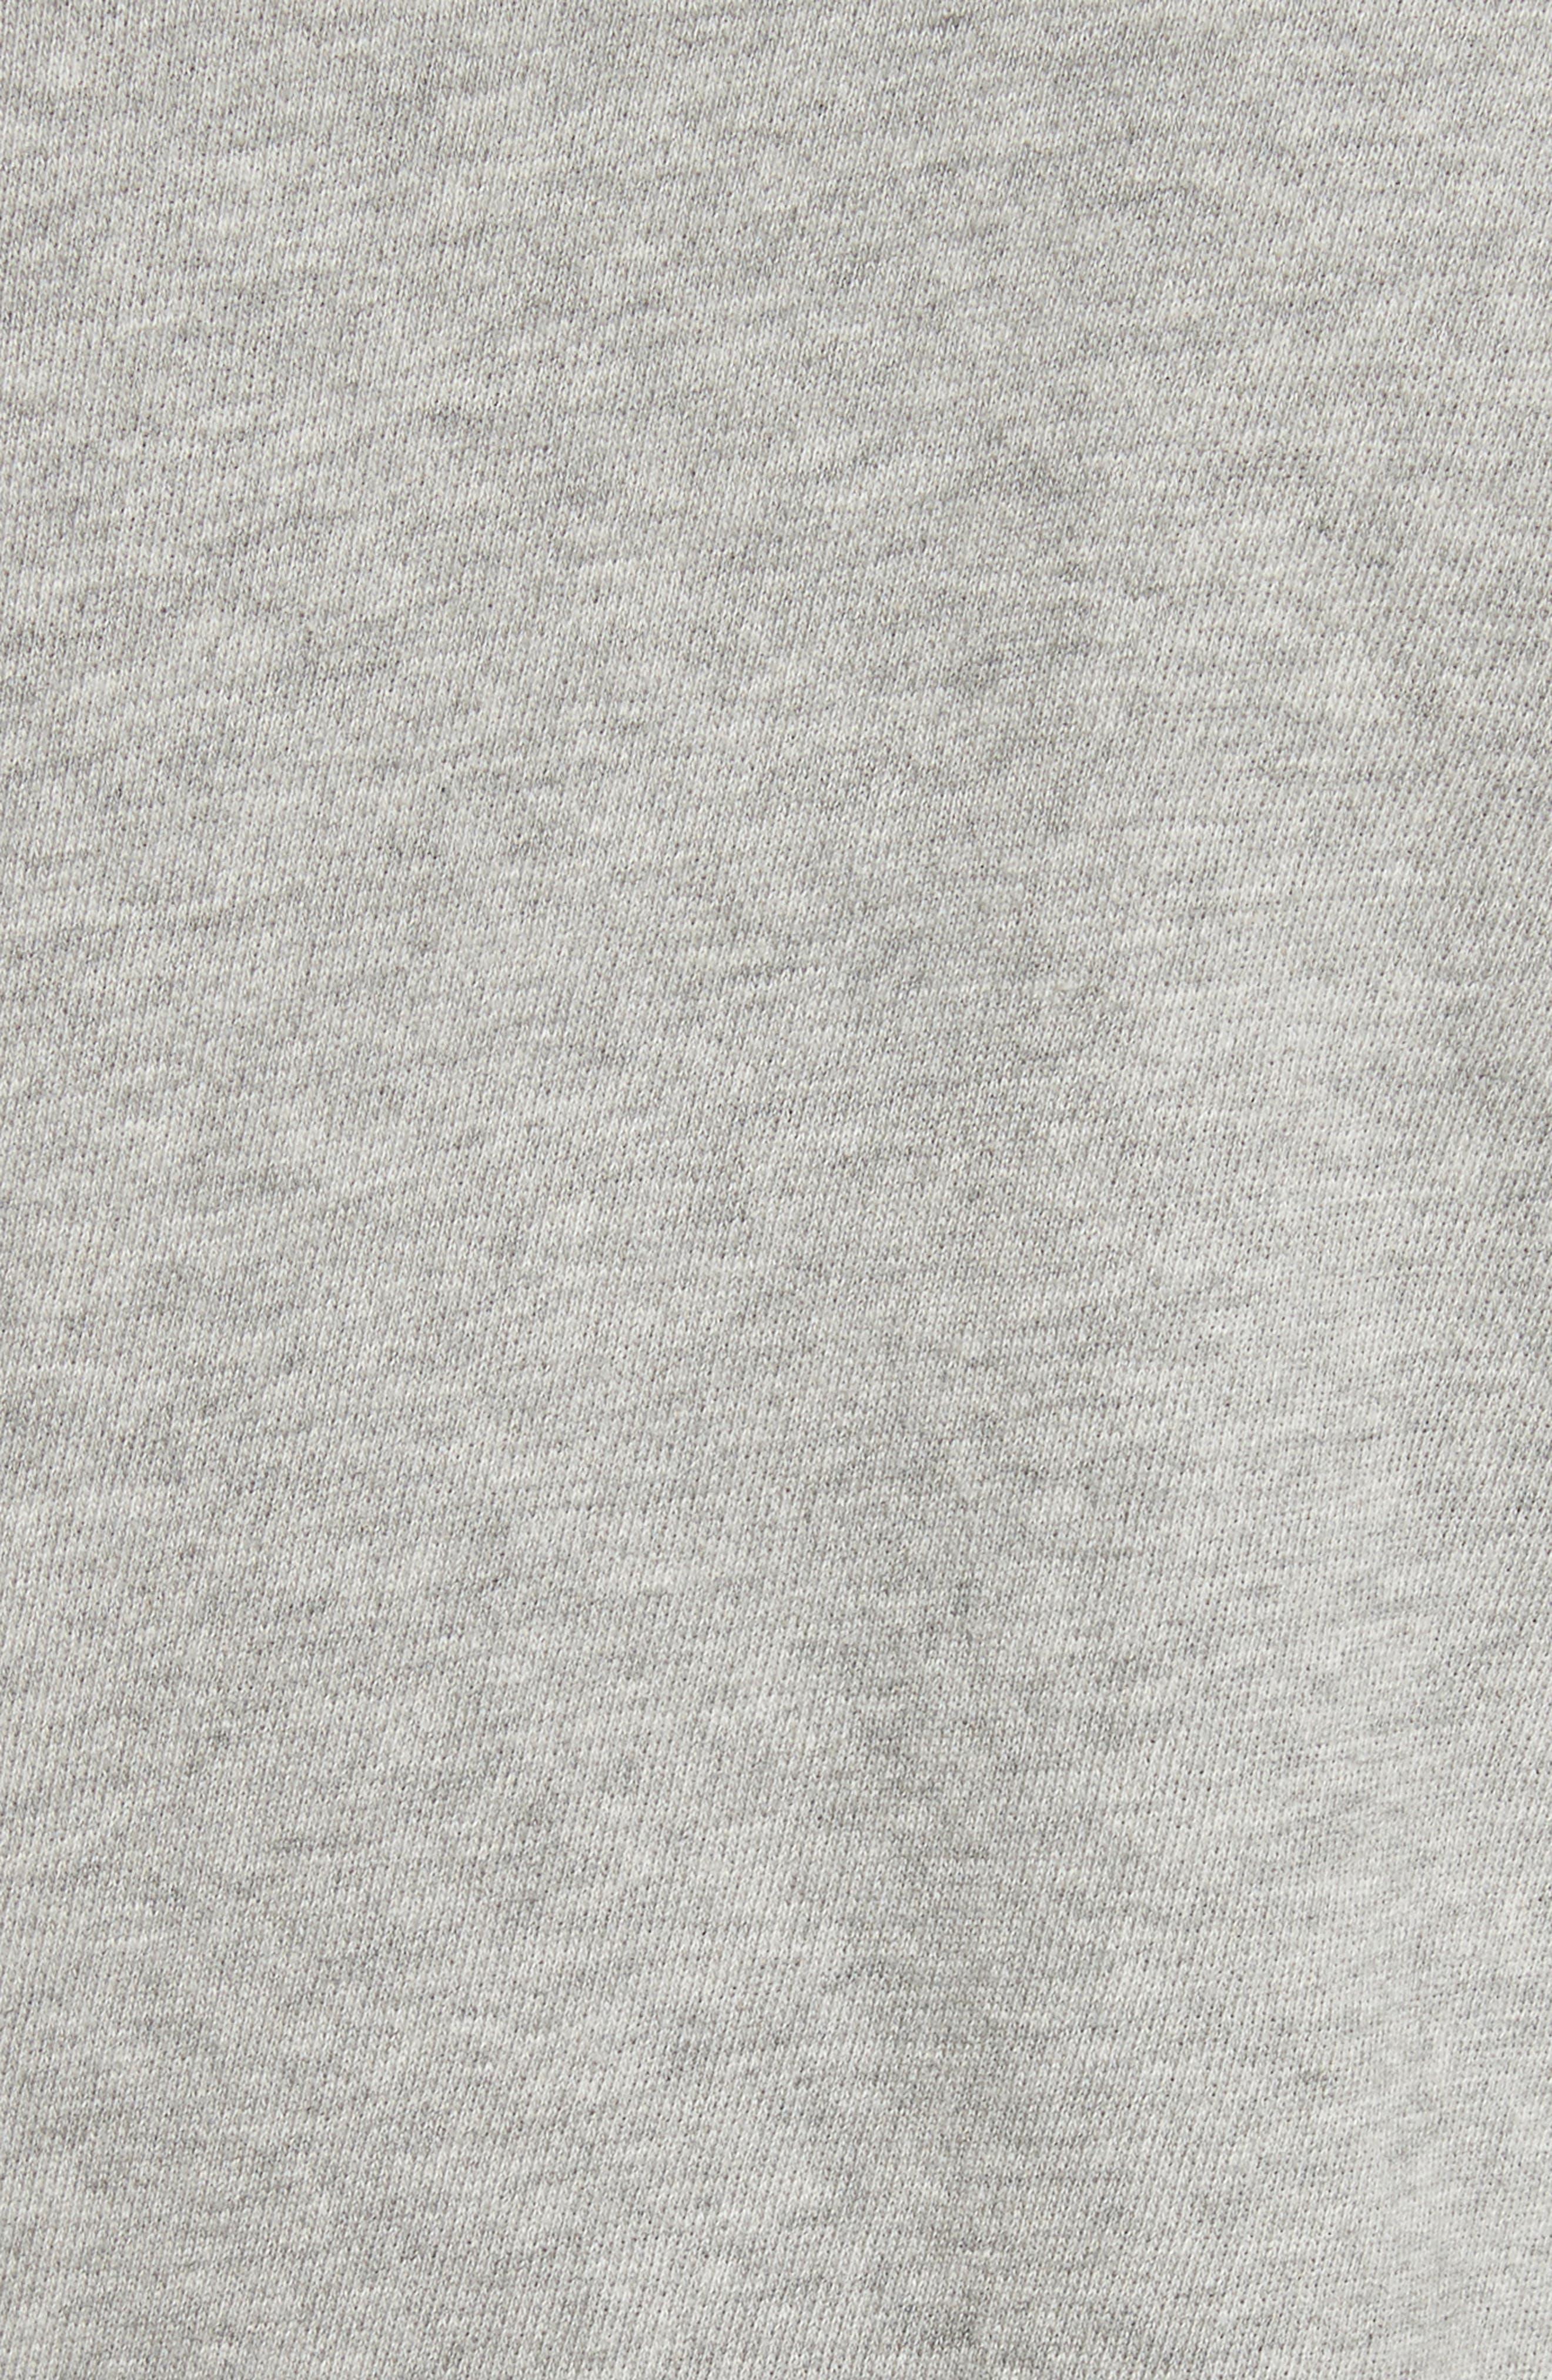 Camden Ruffle Sleeve Top,                             Alternate thumbnail 5, color,                             Heather Grey